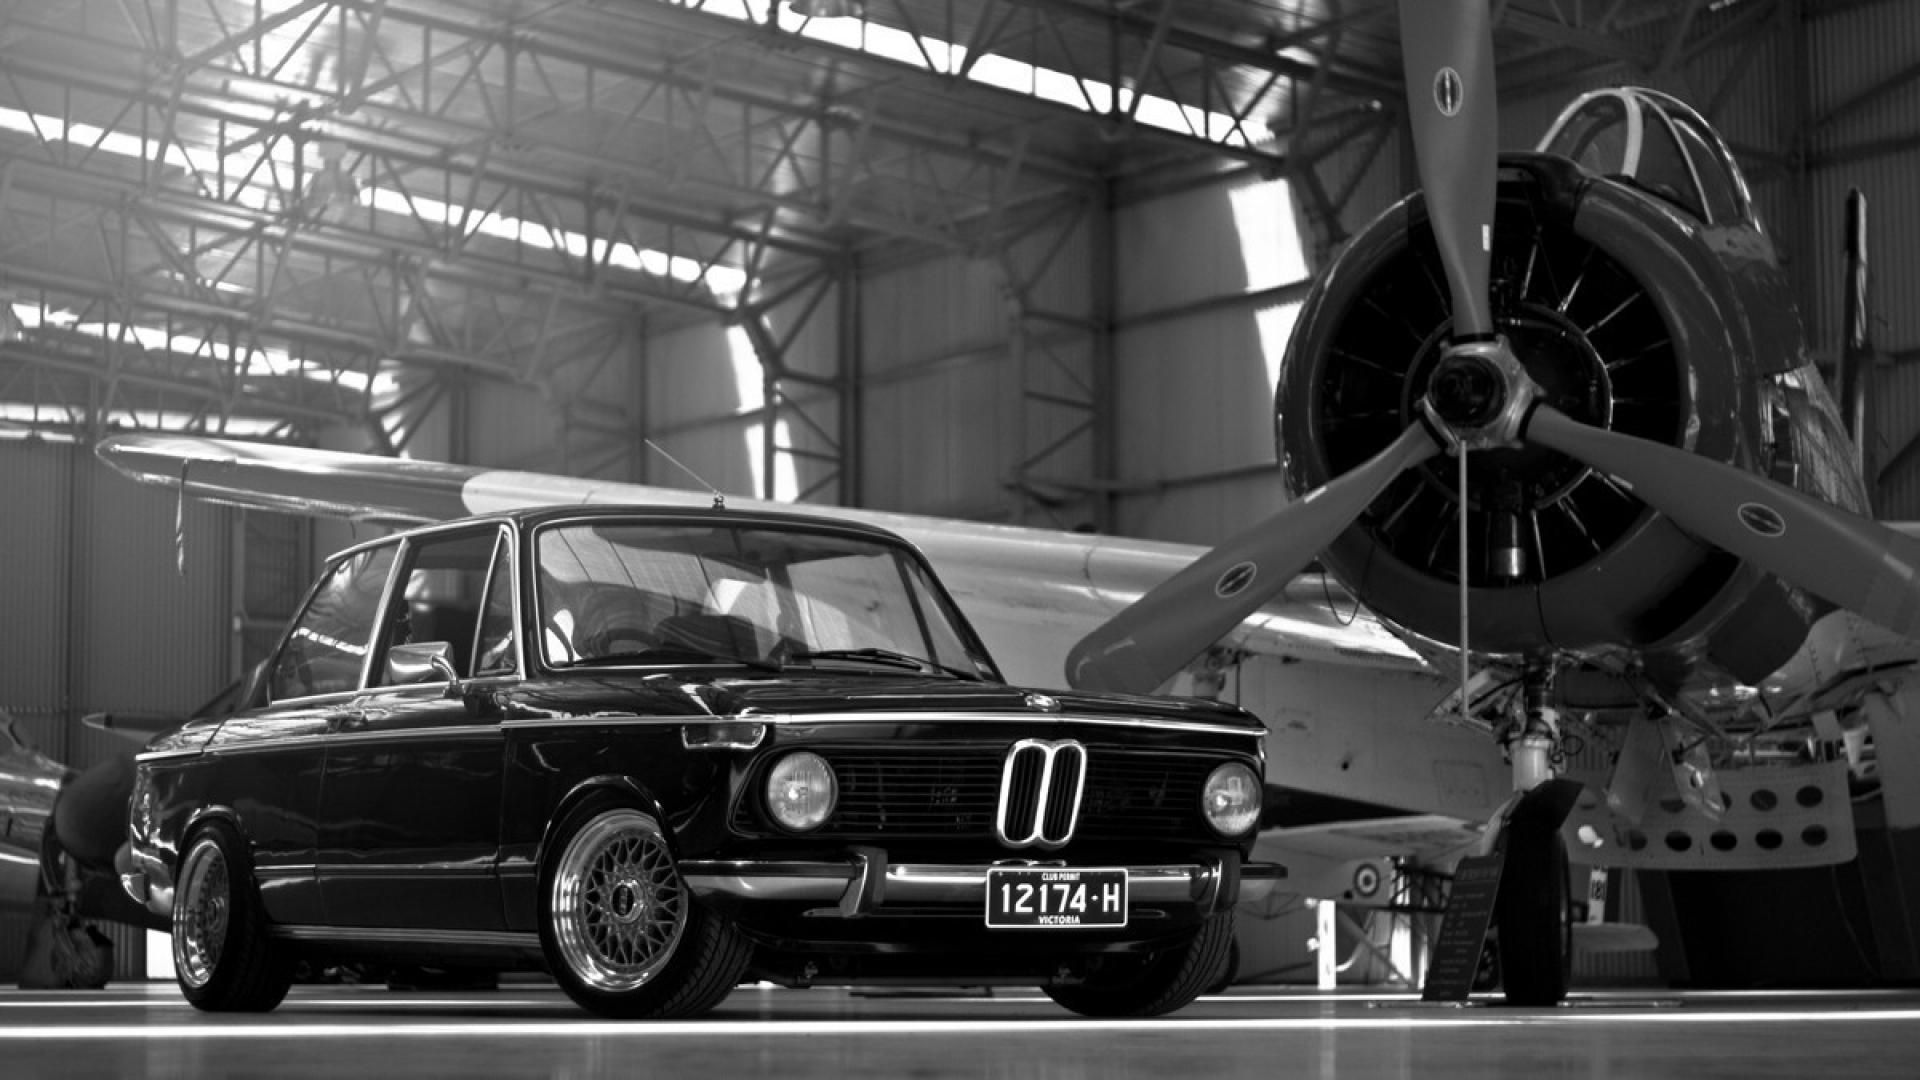 Vintage BMW Wallpapers - Top Free Vintage BMW Backgrounds ...